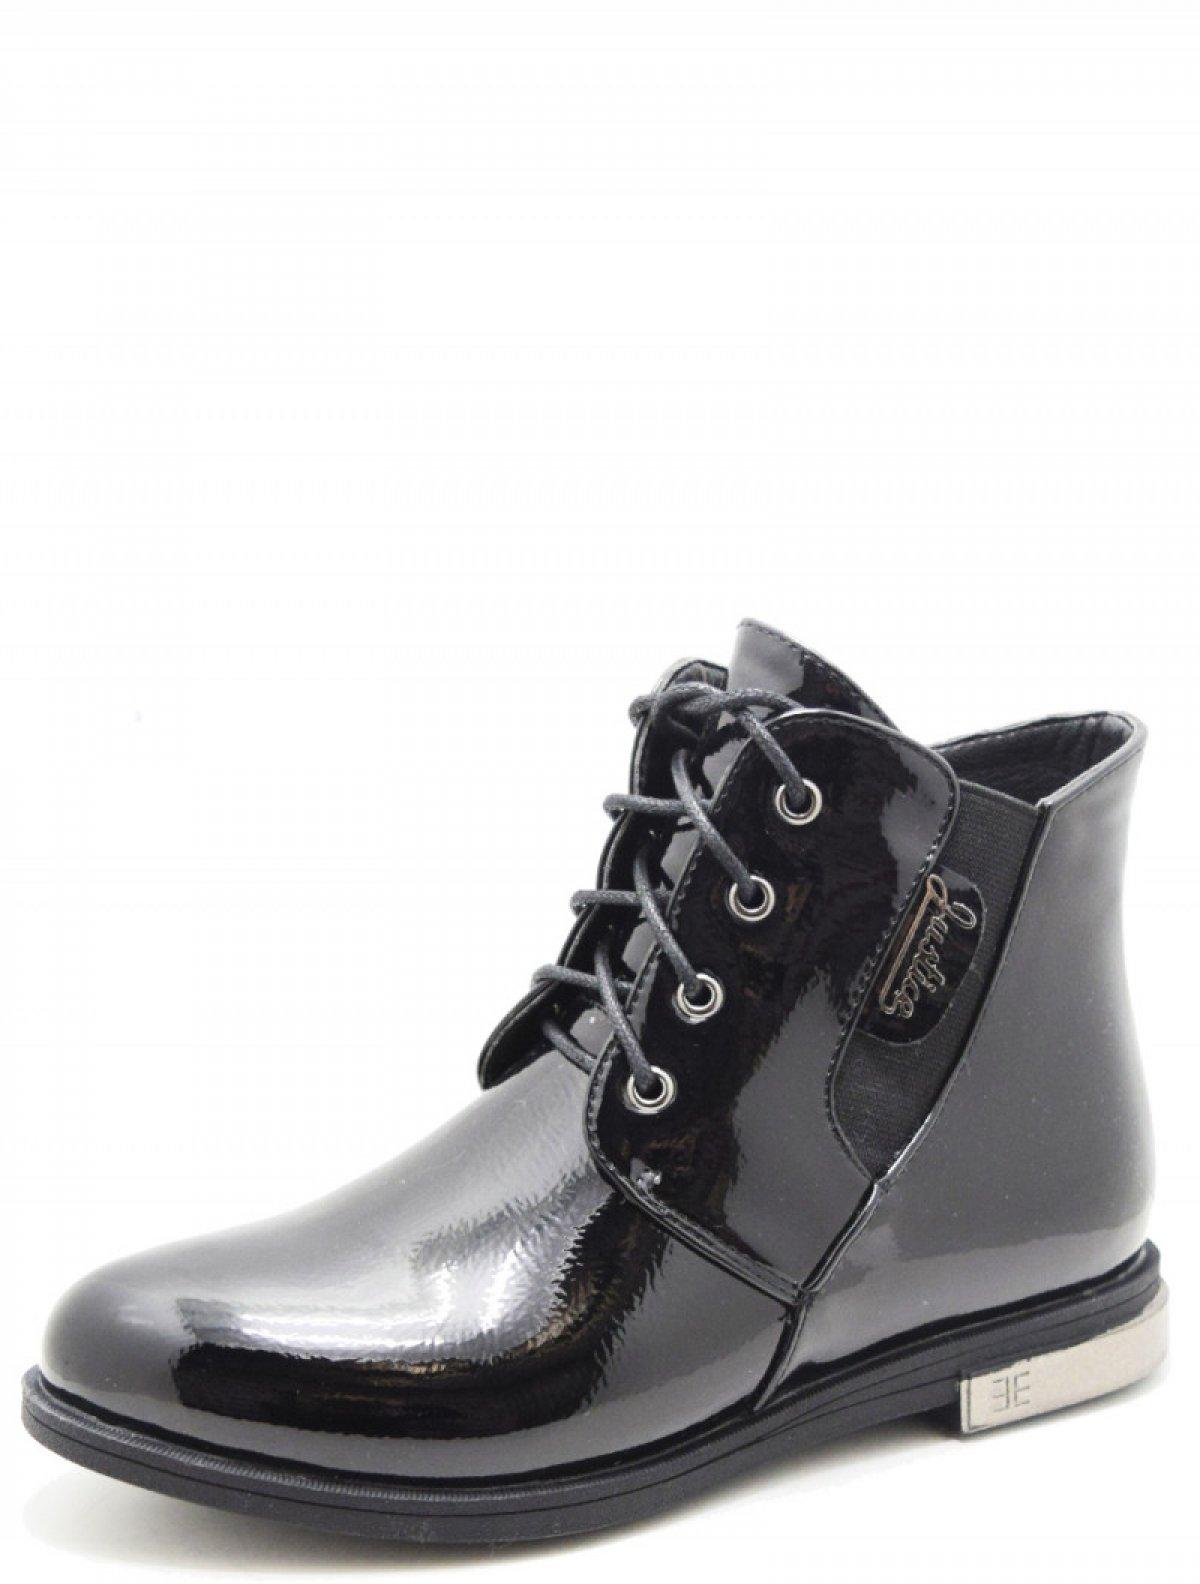 BI&KI A-B05-12-C ботинки для девочки